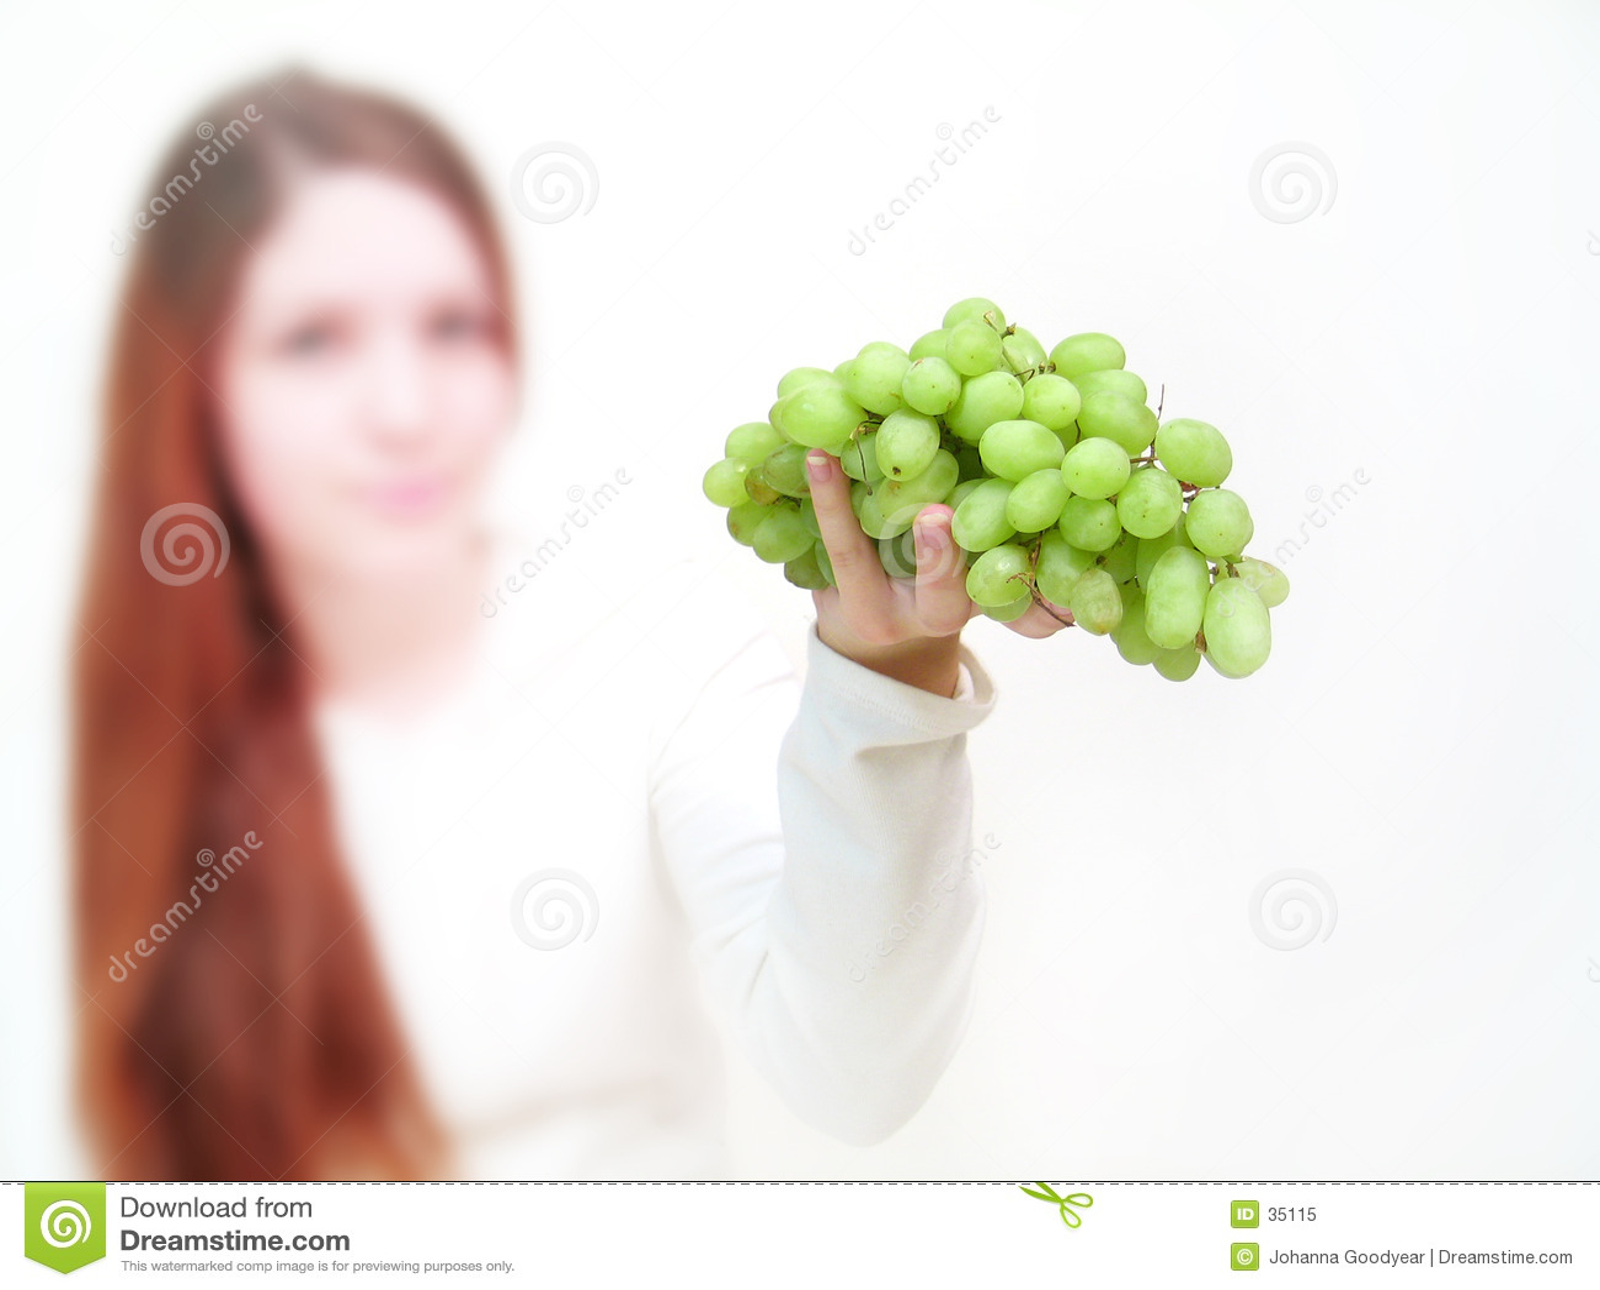 Grape offering